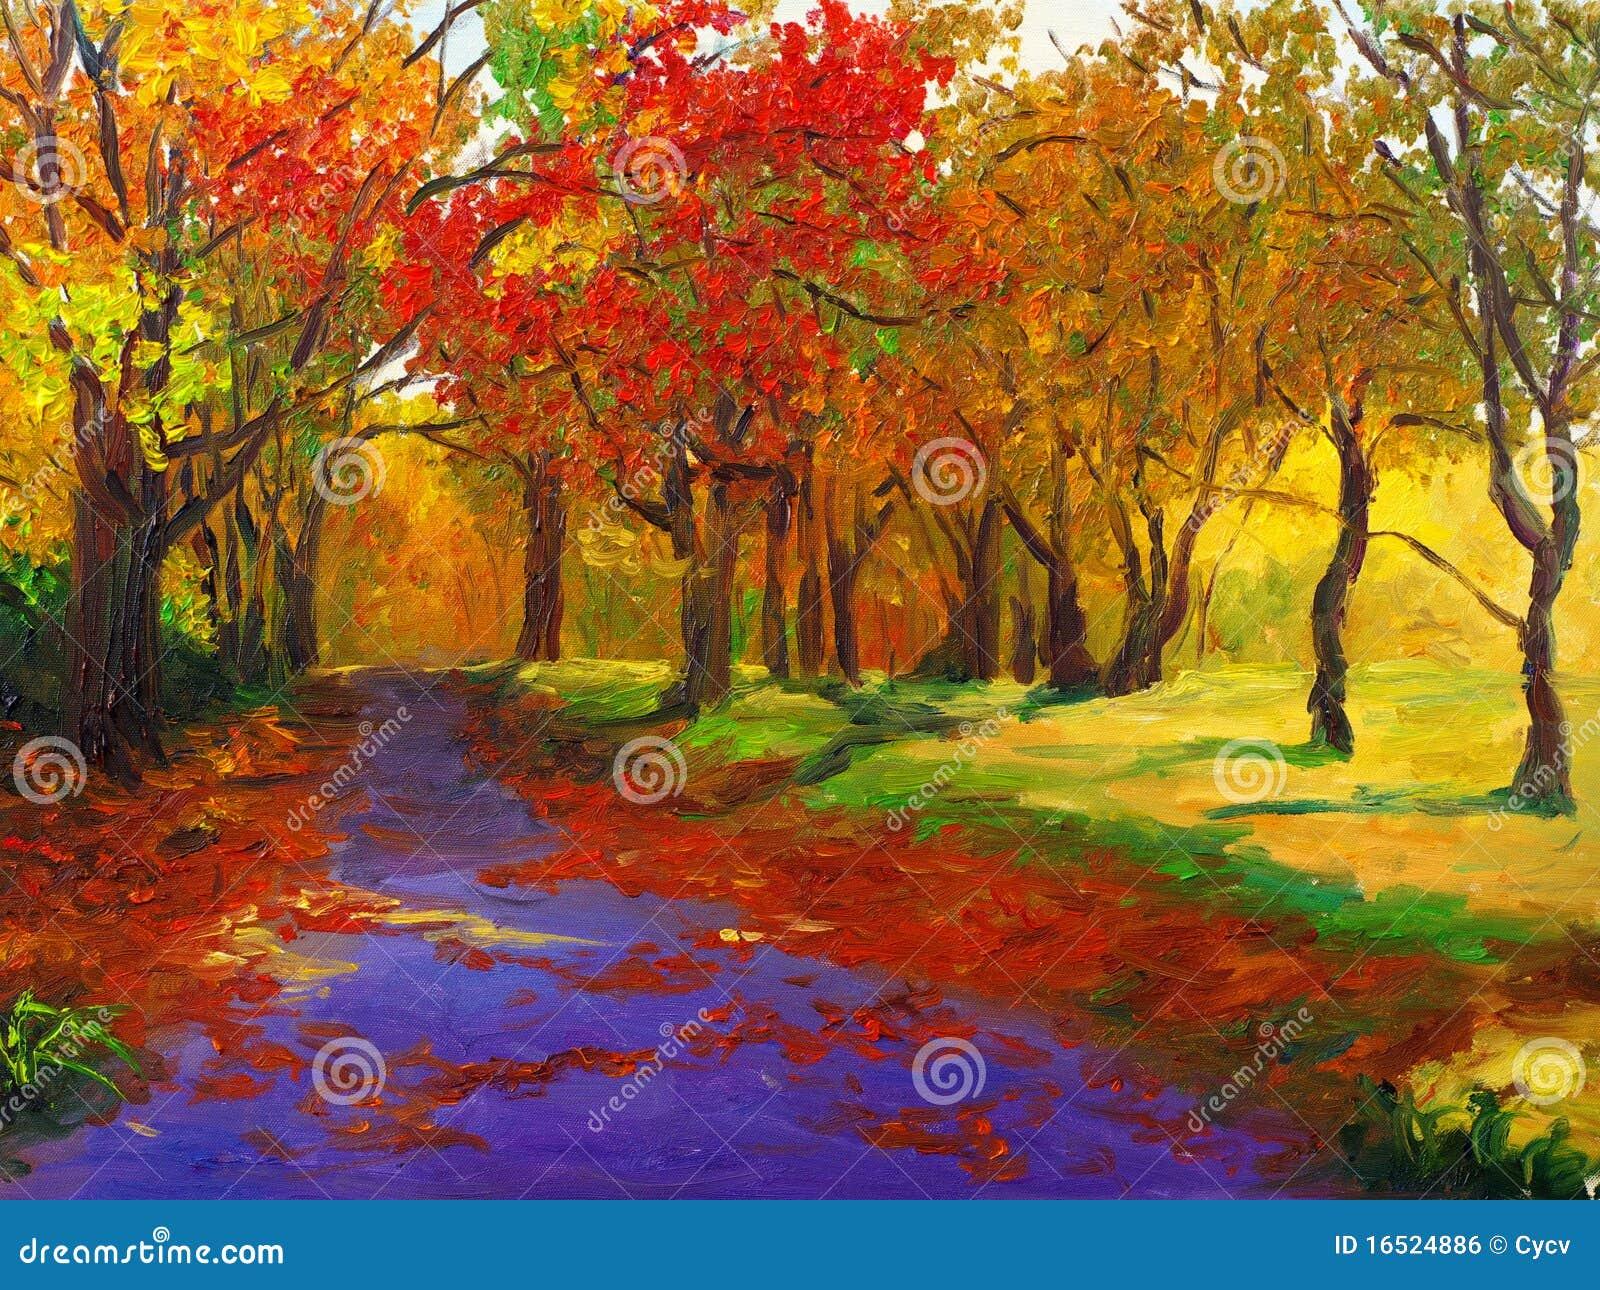 Oil Painting - Maple in Autumn